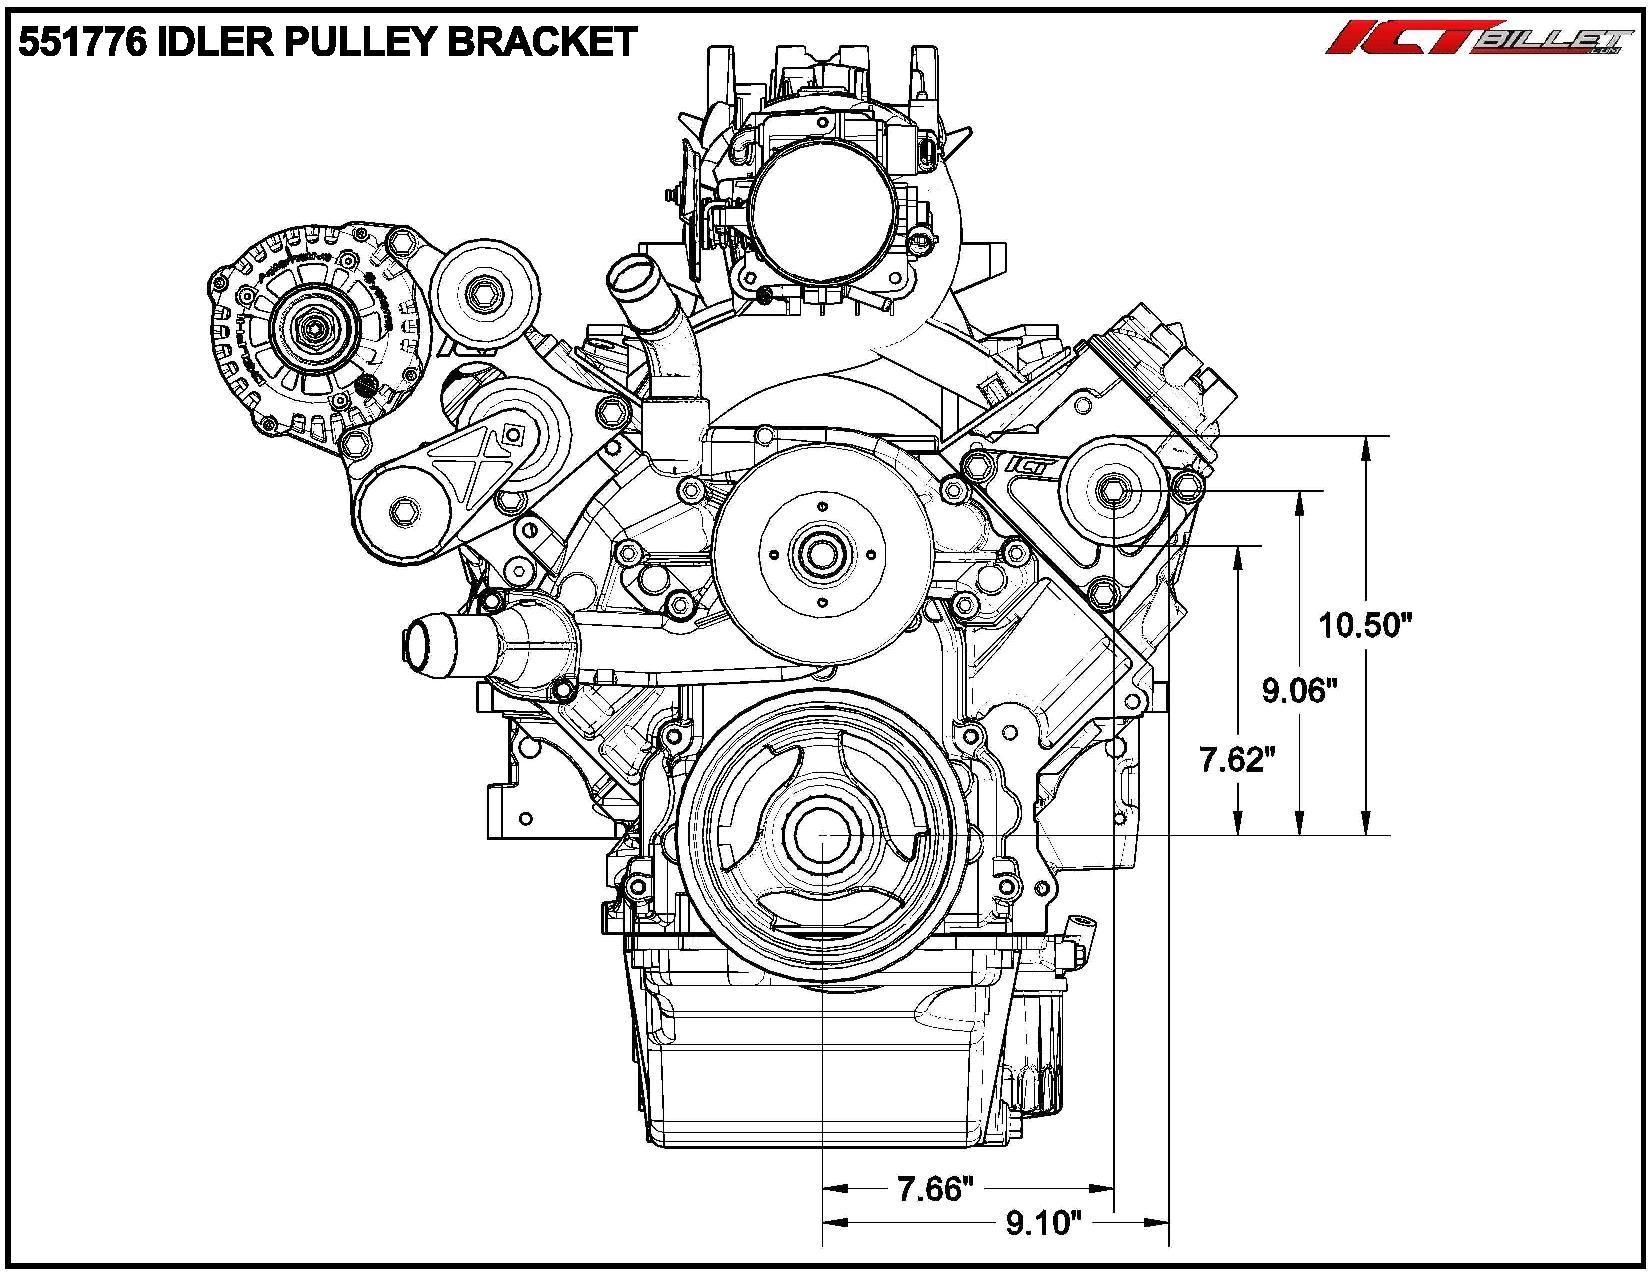 ls idler pulley bracket